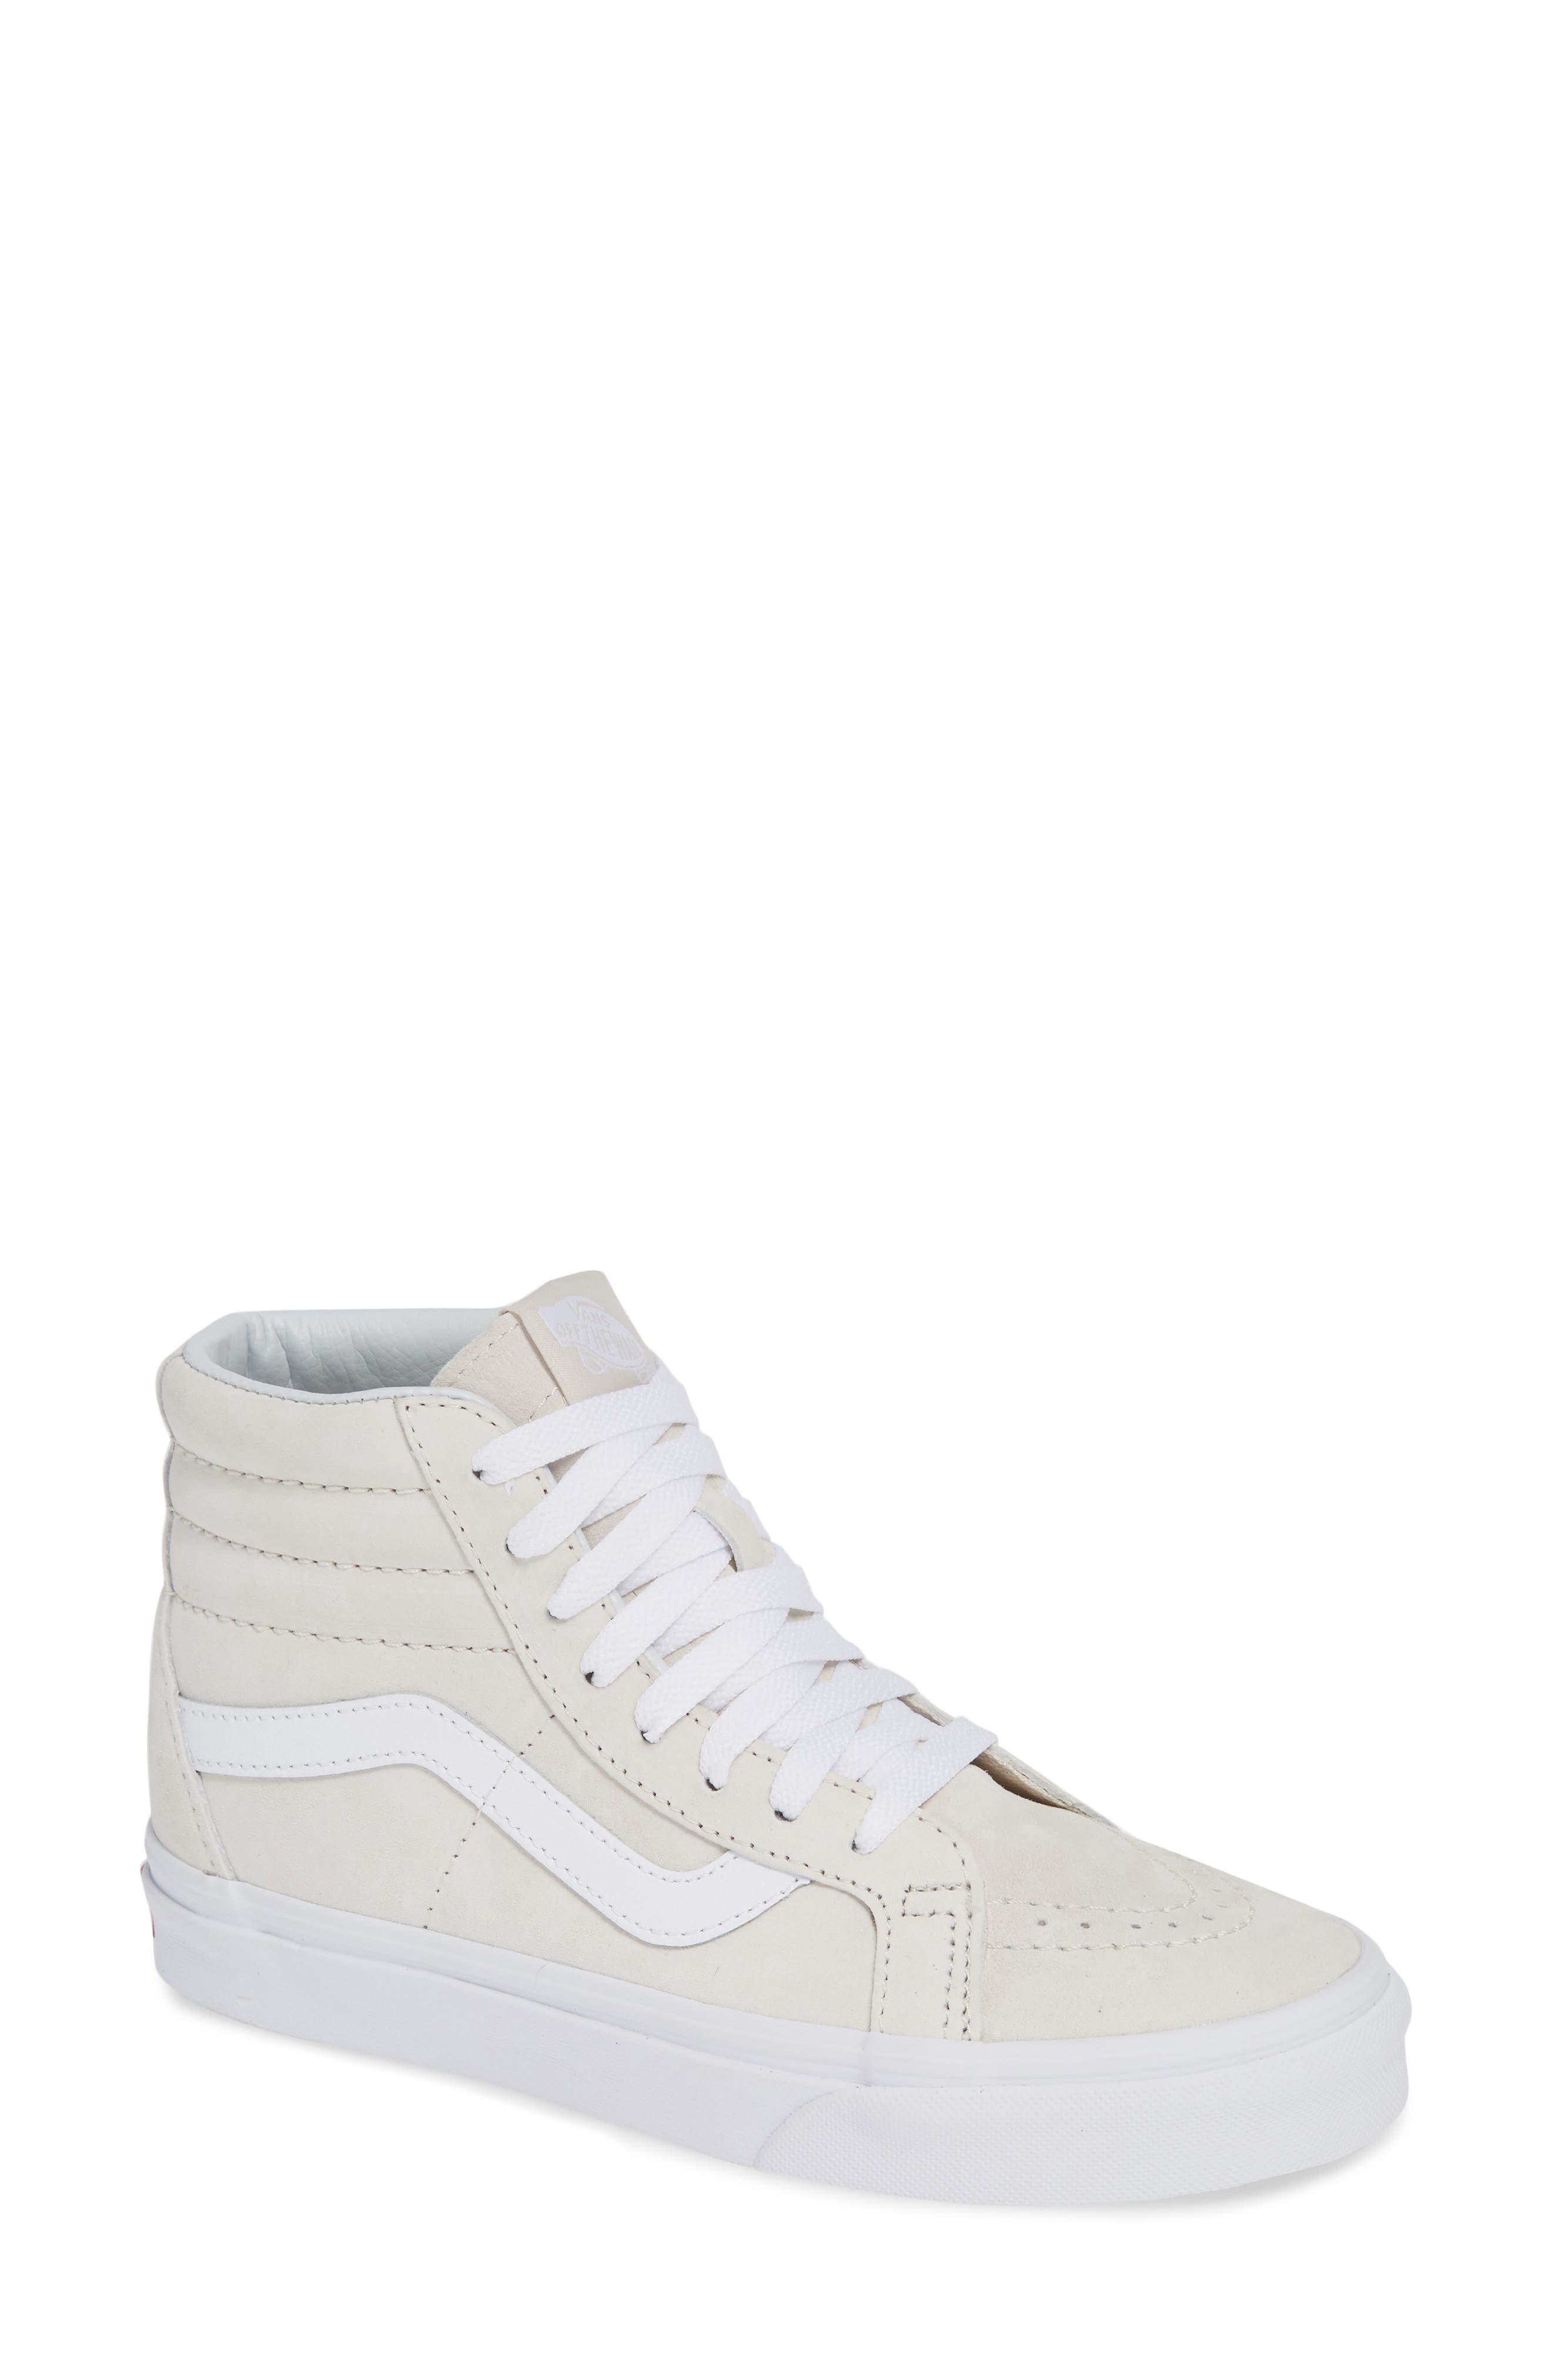 Sk8-Hi Reissue Sneaker,                         Main,                         color, 270